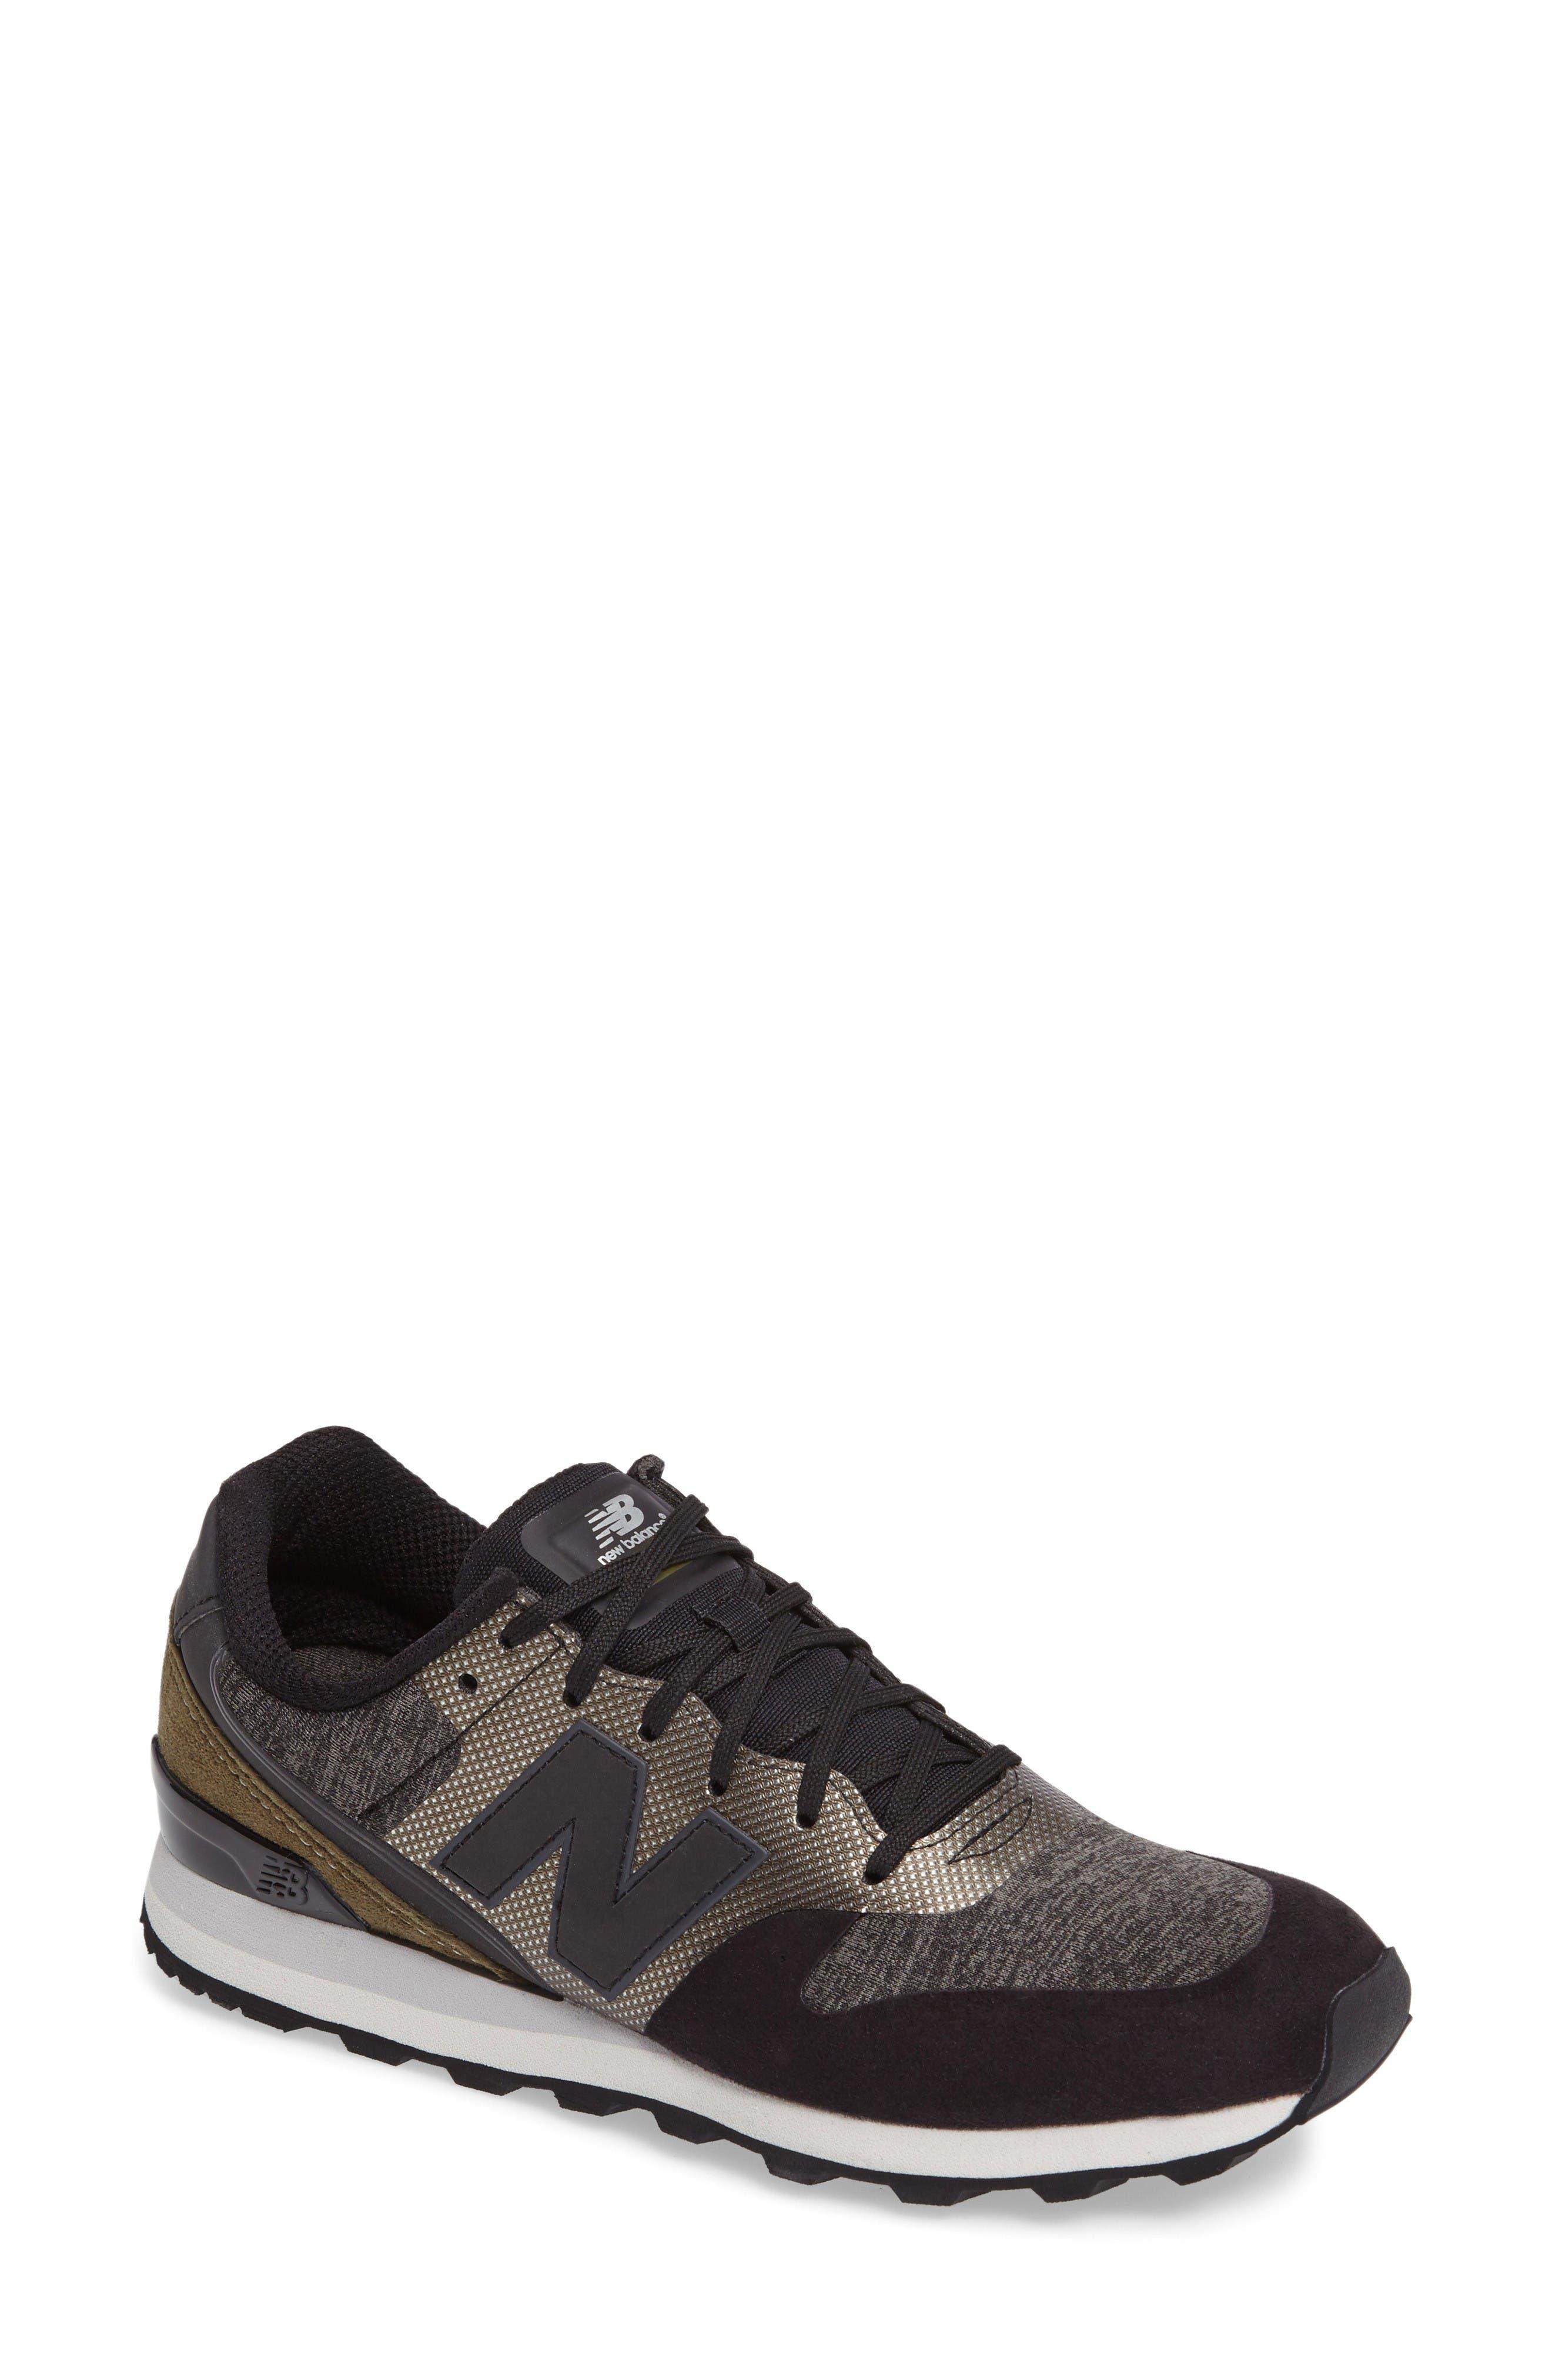 New Balance 696 Re-Engineered Sneaker (Women)